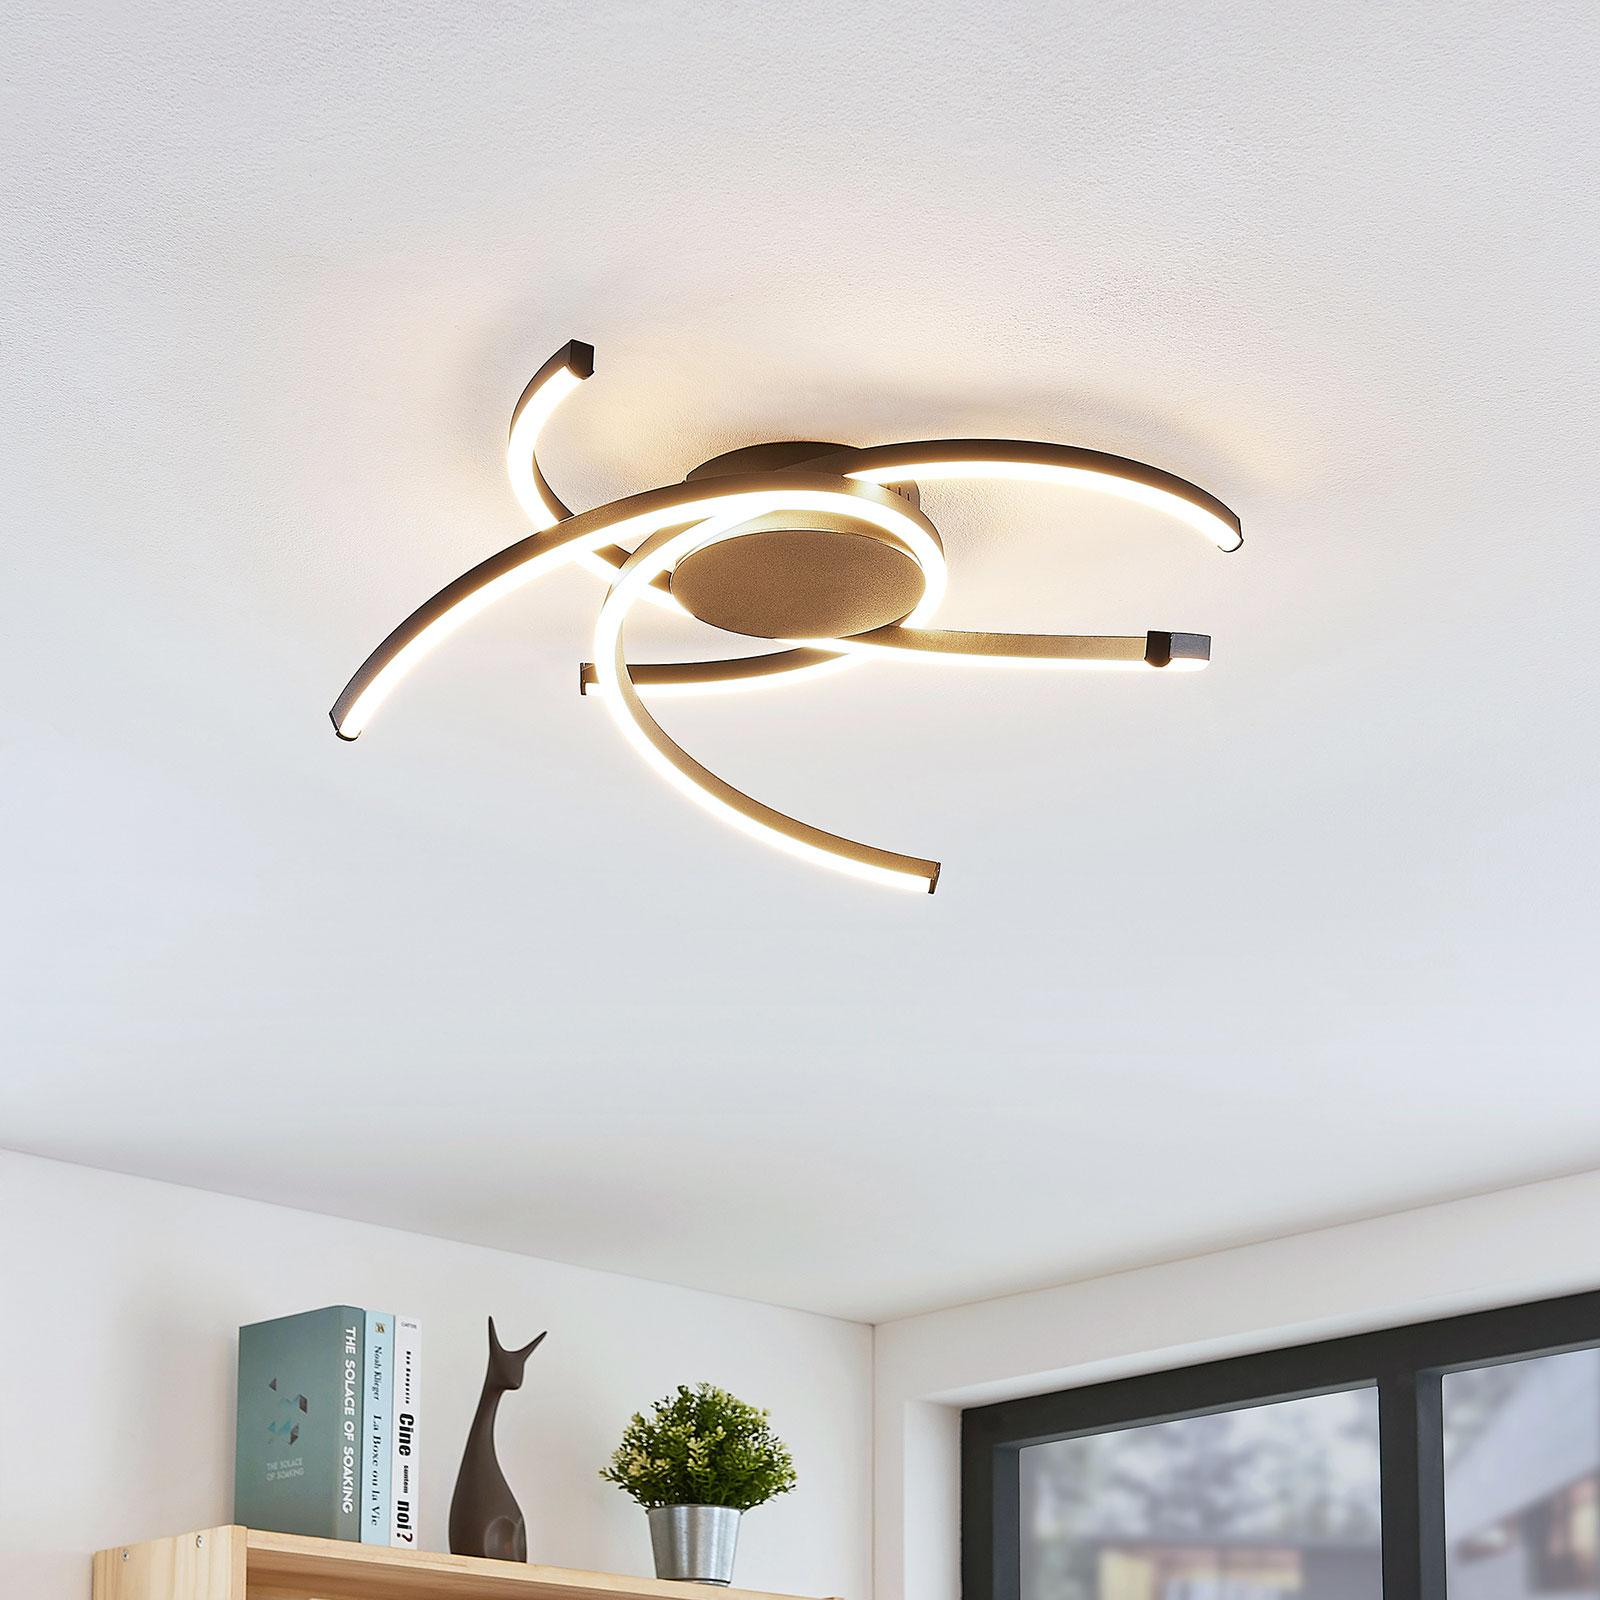 Lindby Katris LED-Deckenleuchte, 58 cm, schwarz